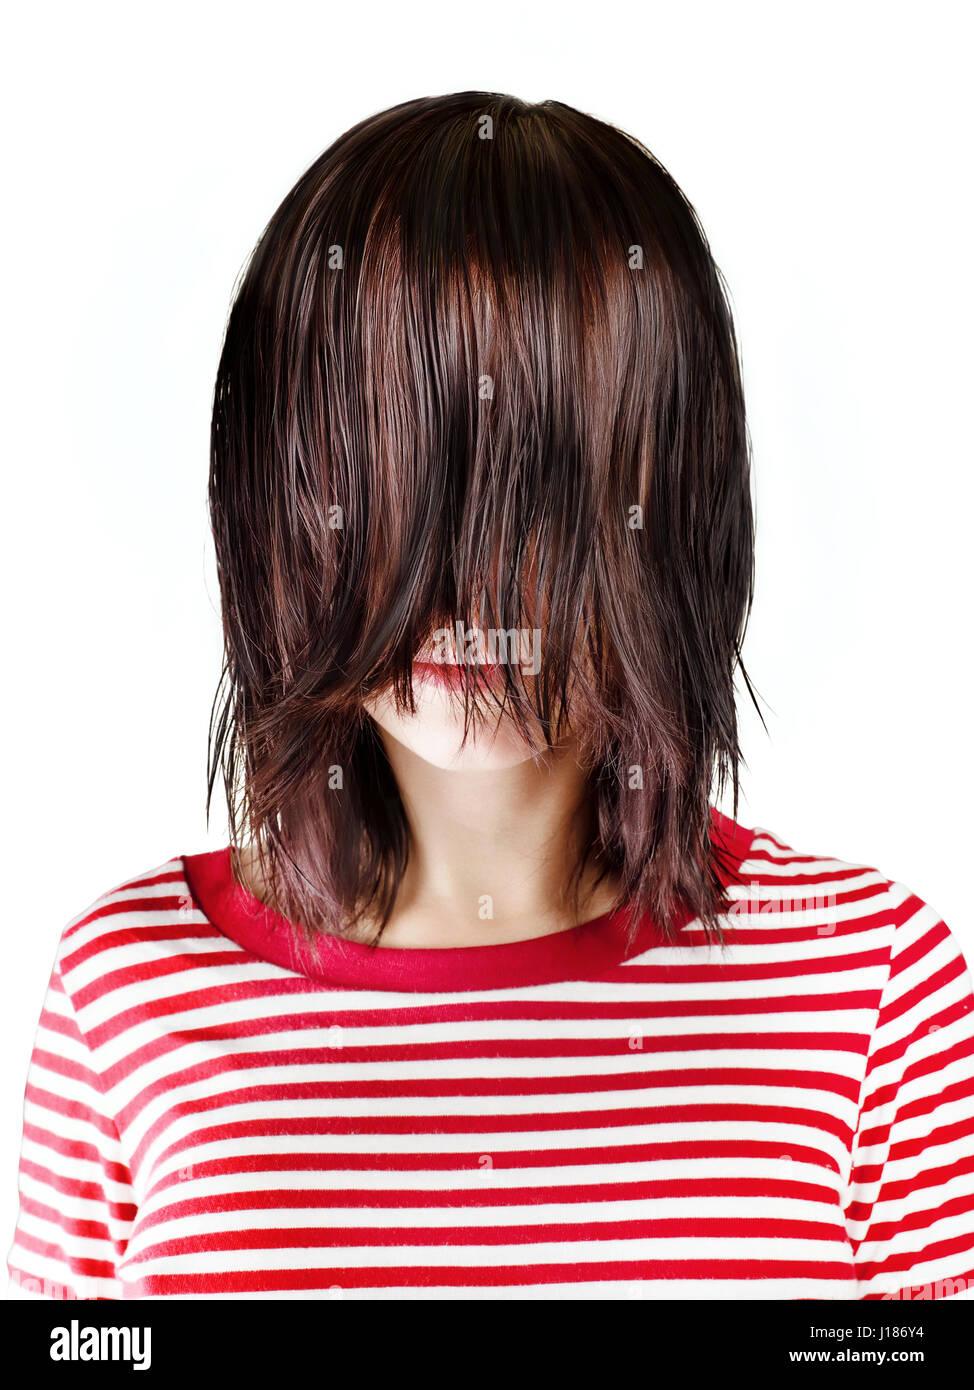 brunette girl in red striped shirt. black straight uncut